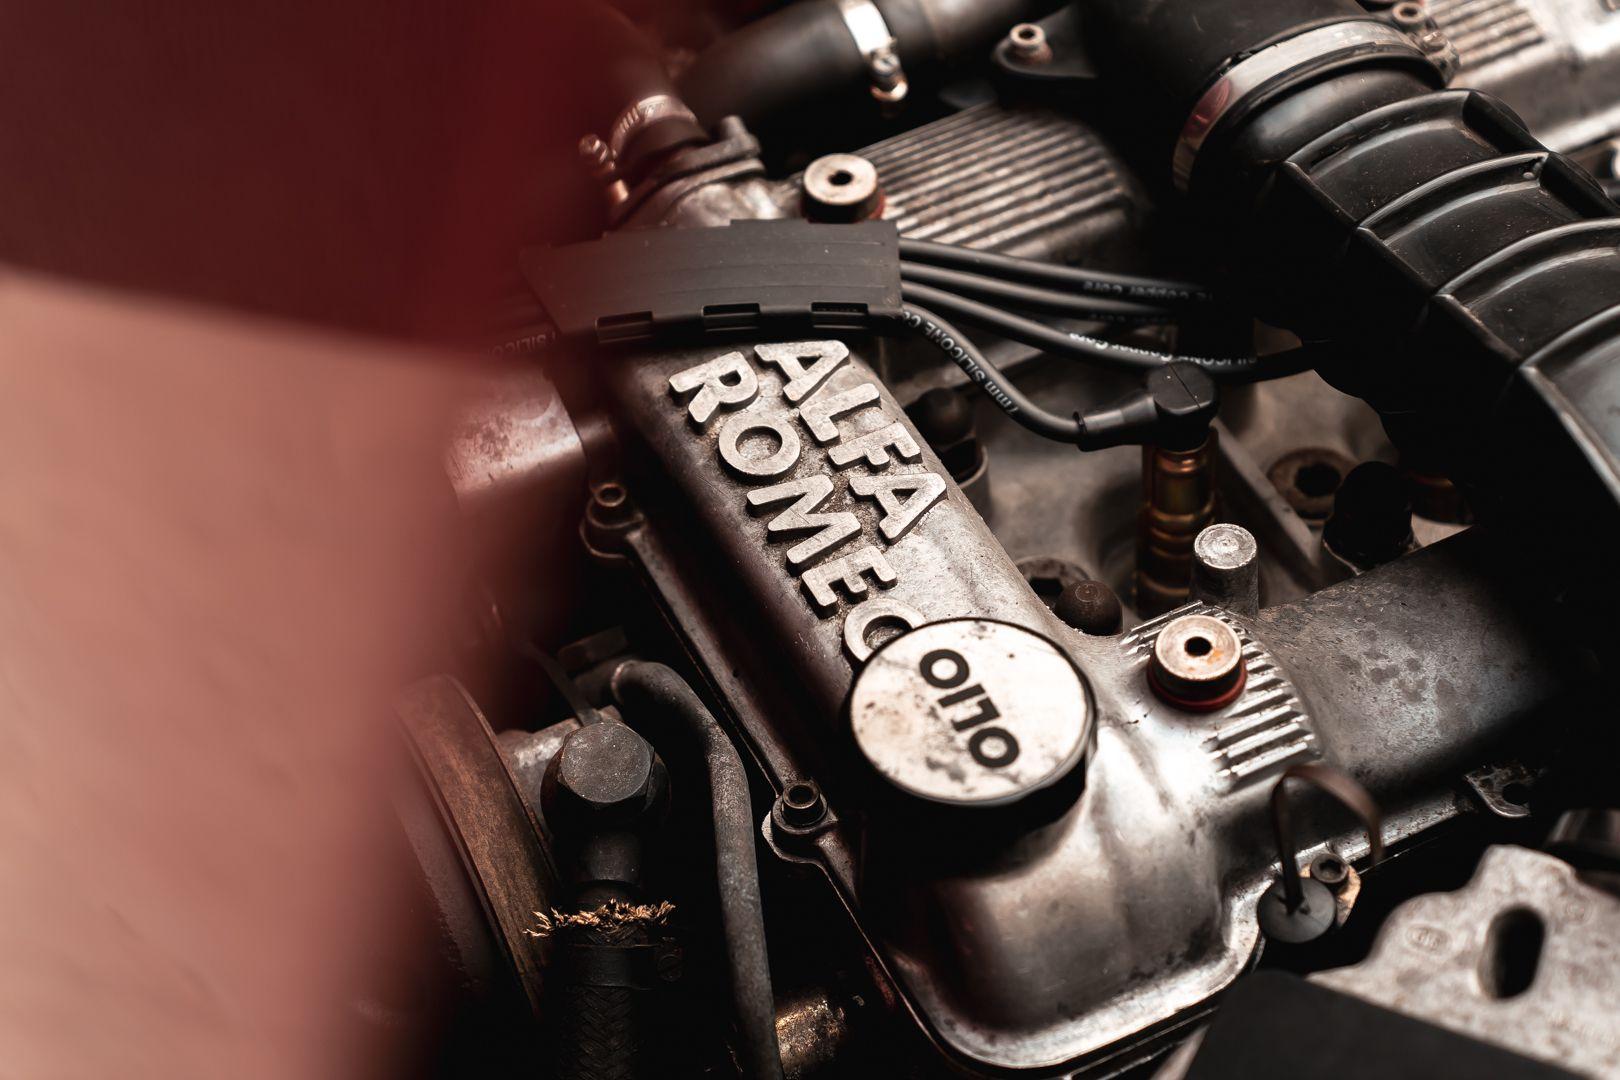 1990 Alfa Romeo Duetto 2000 IV Serie 79795